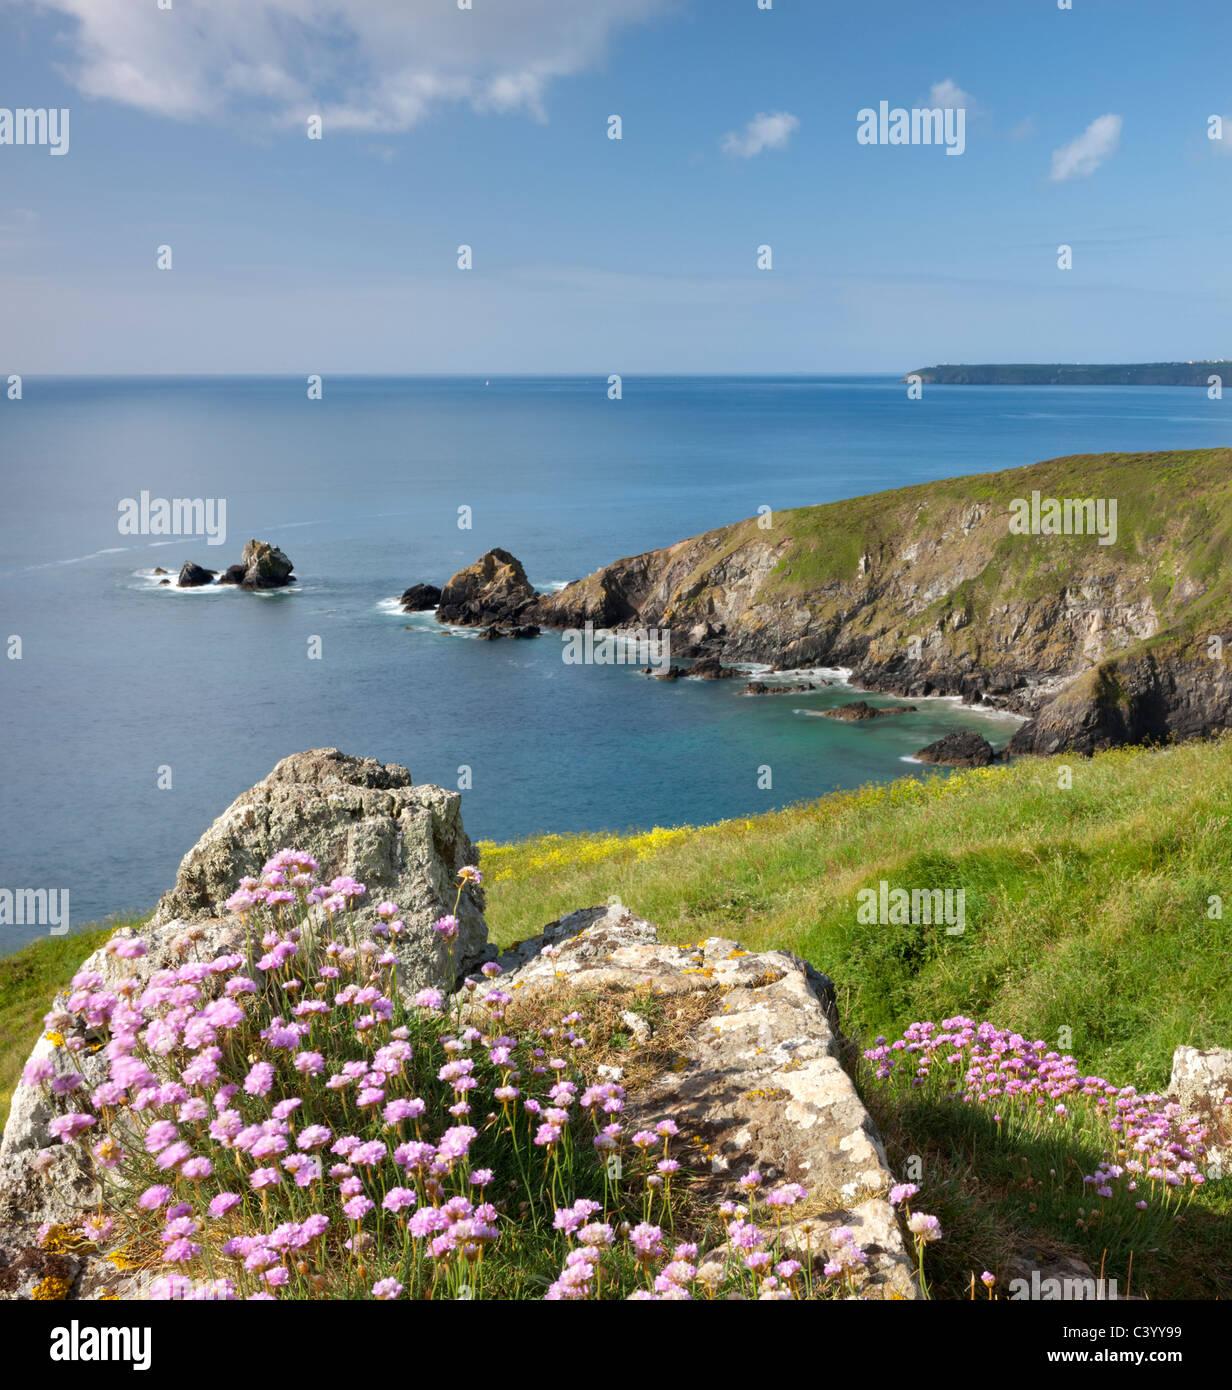 Sea thrift (Armeria maritima) growing on cliffs above Carrick Luz headland, Lizard Peninsula, Cornwall. Spring (May) - Stock Image